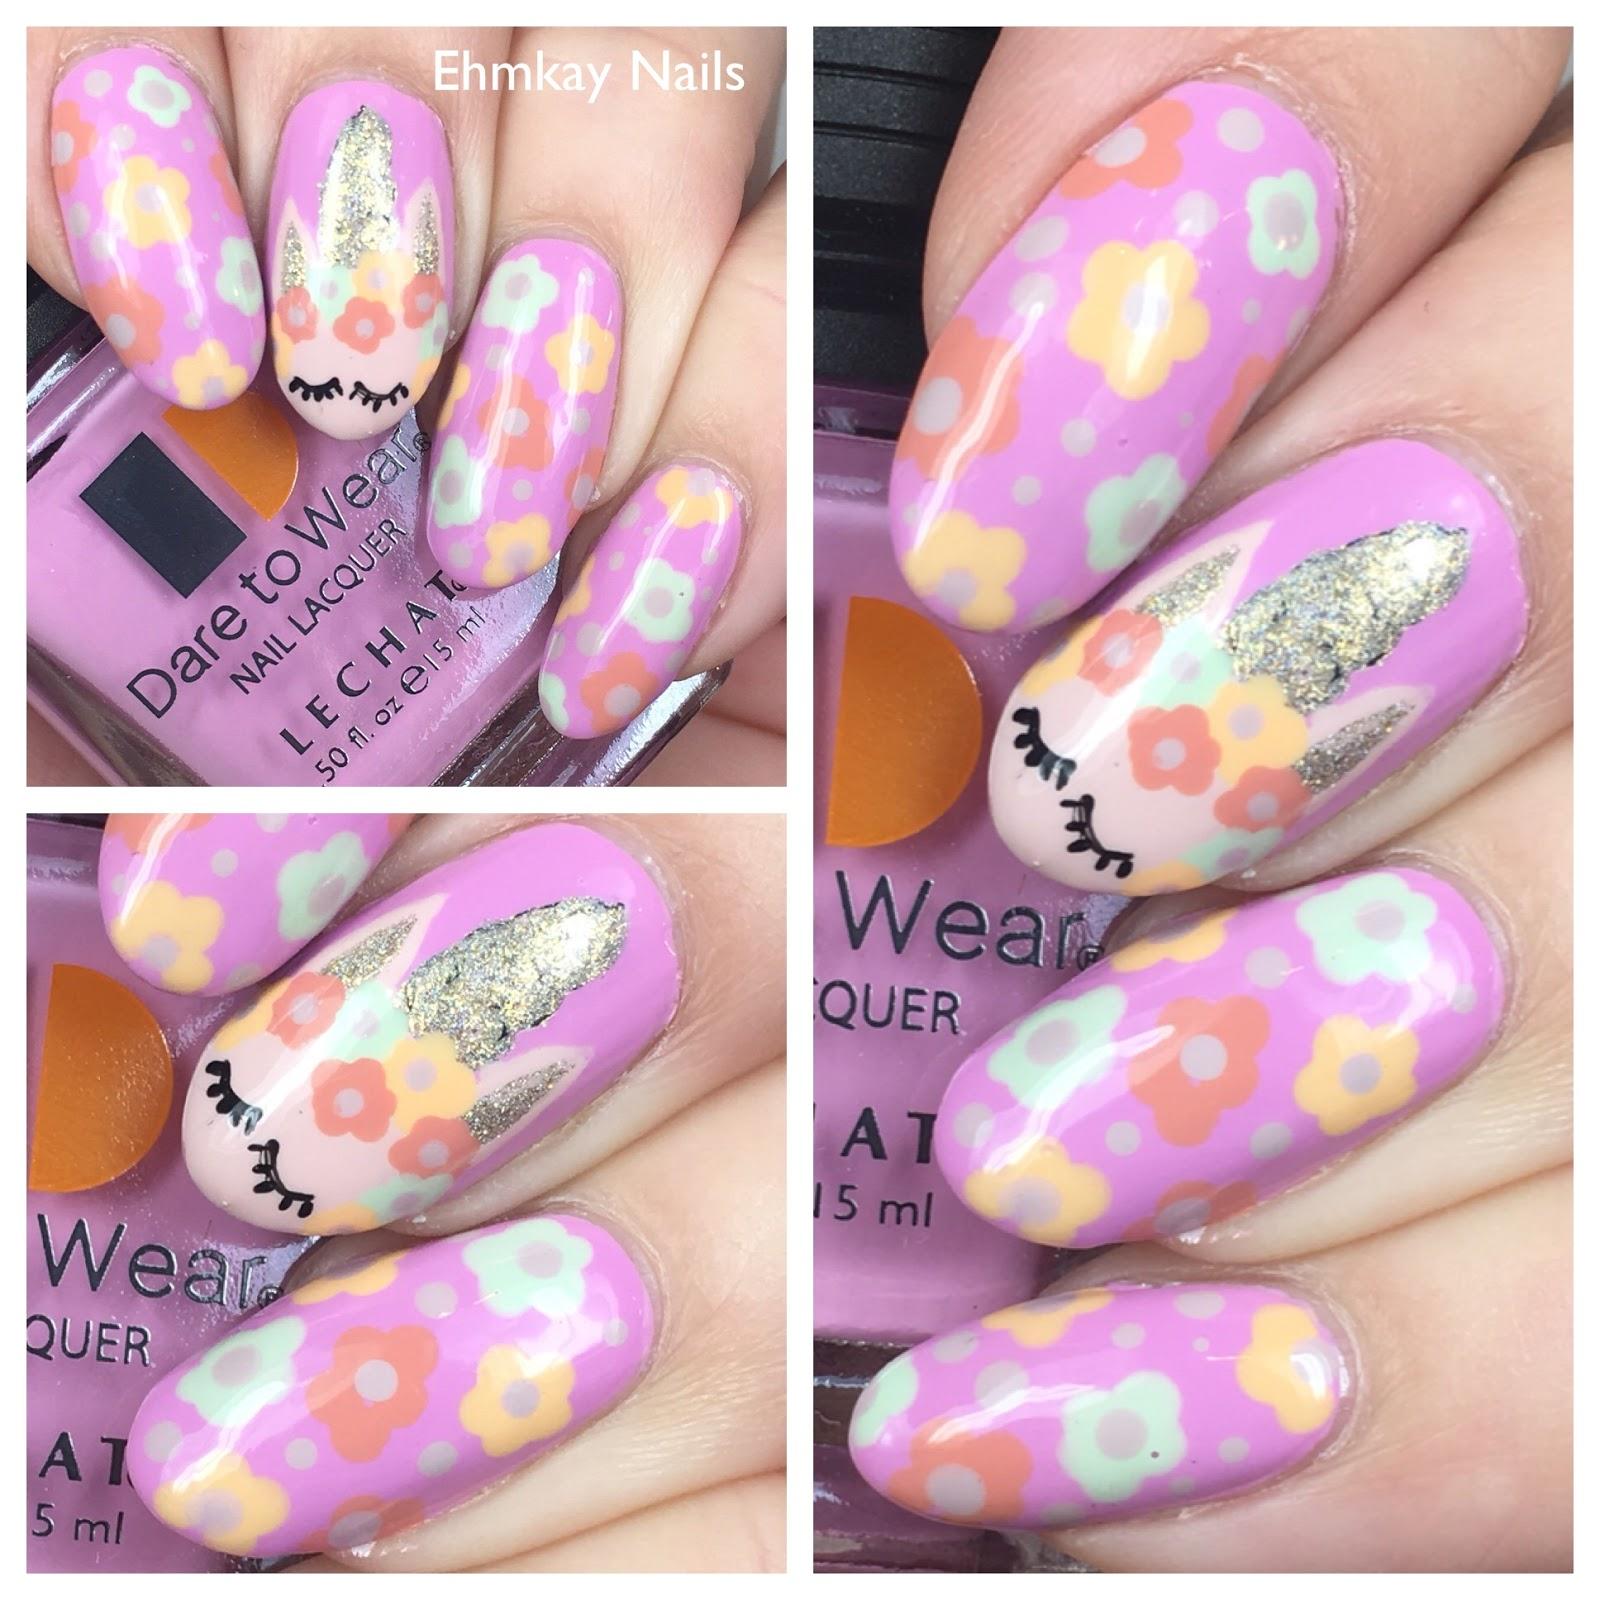 Ehmkay Nails Unicorn Nail Art With Lechat English Rose Collection